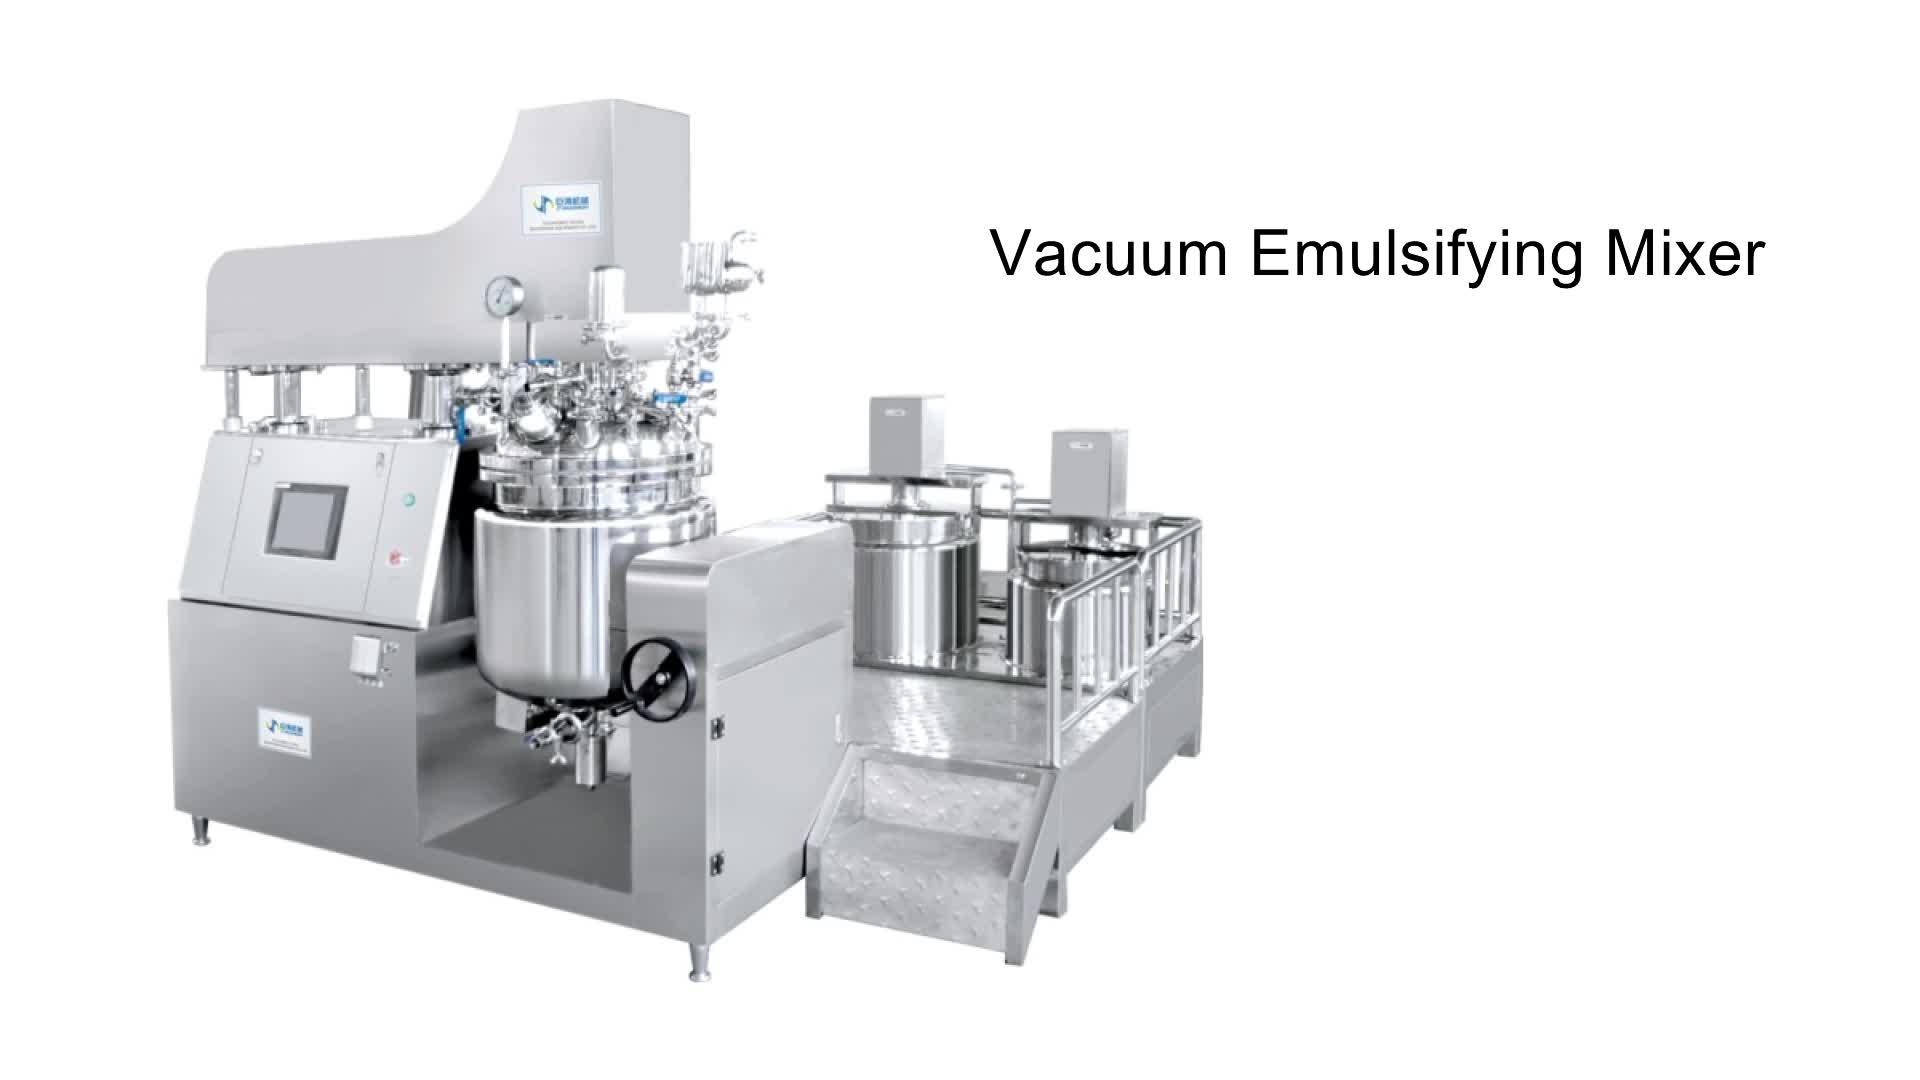 जीएमपी मानक 50L वैक्यूम homogenizing पायसीकारकों शरीर क्रीम मिक्सर मशीन